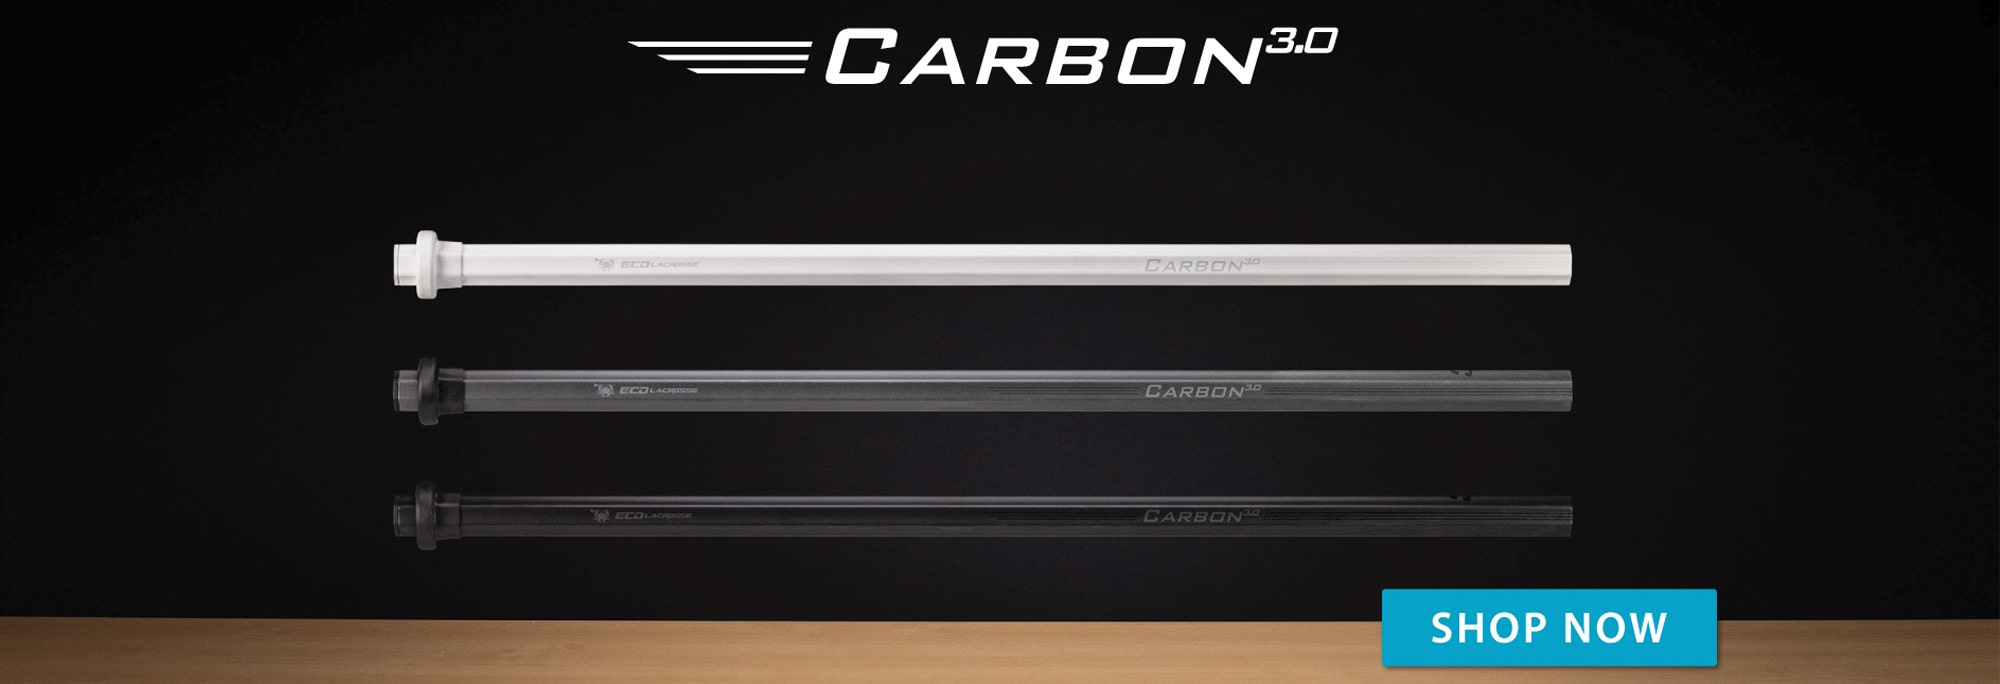 ECD Carbon 3.0 - Desktop